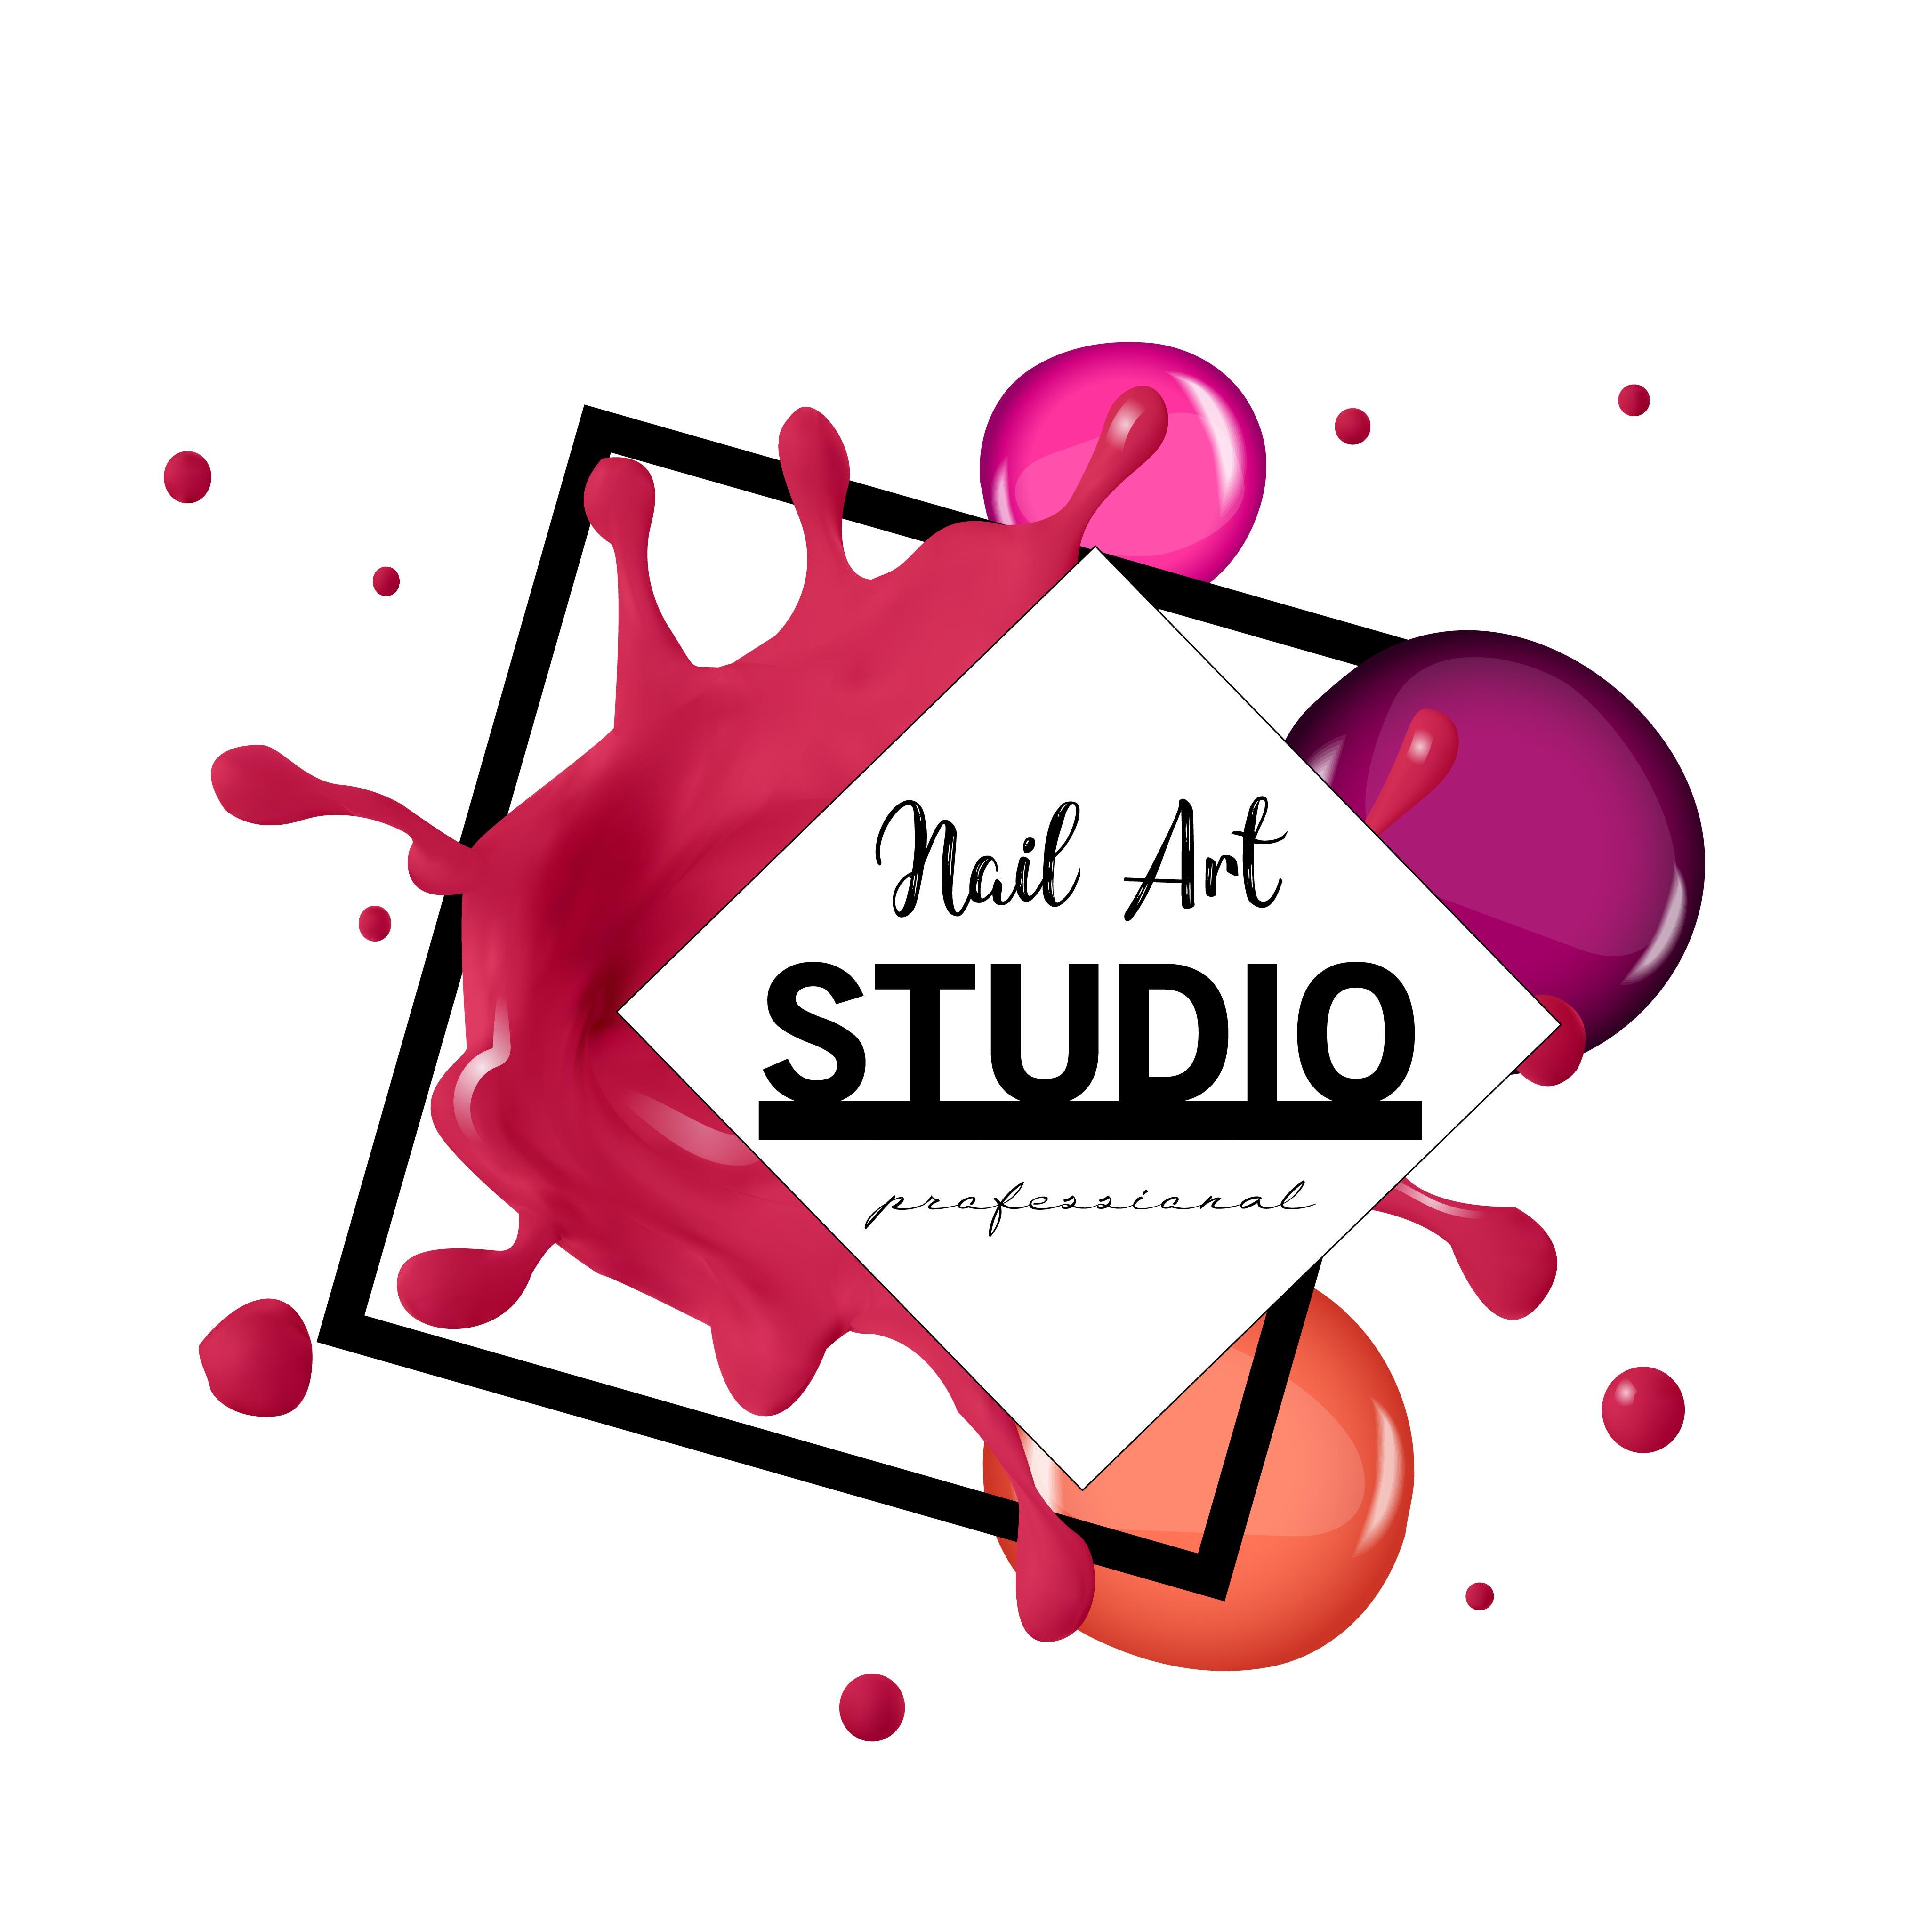 Nail Art Studio Logo Design Template Download Free Vector Art Stock Graphics Amp Images